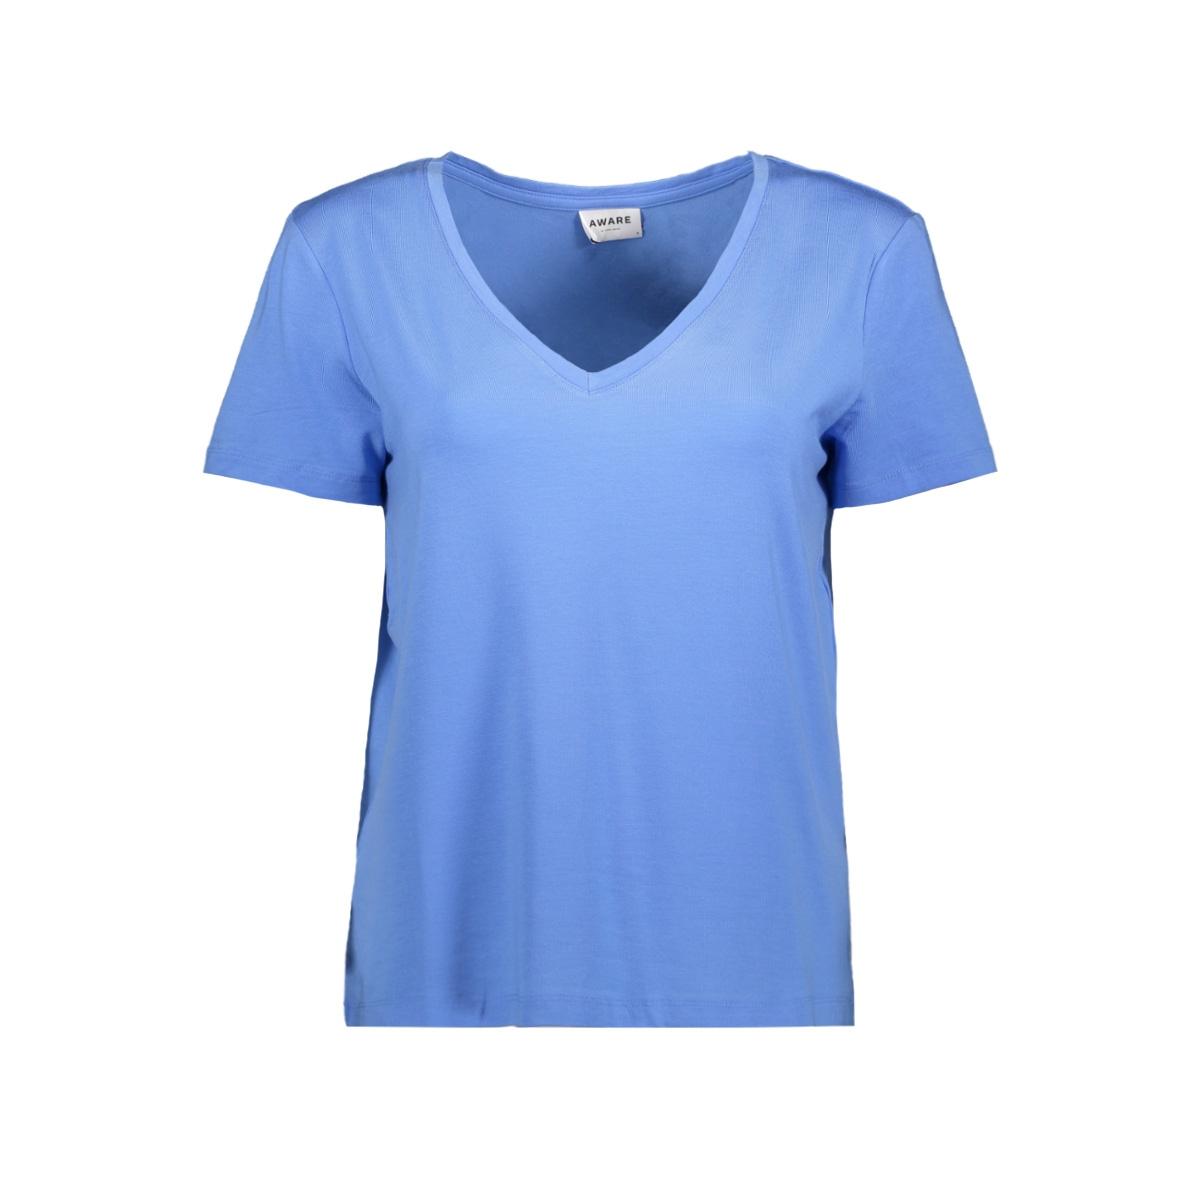 vmdina s/s v-neck vma 10199009 vero moda t-shirt granada sky